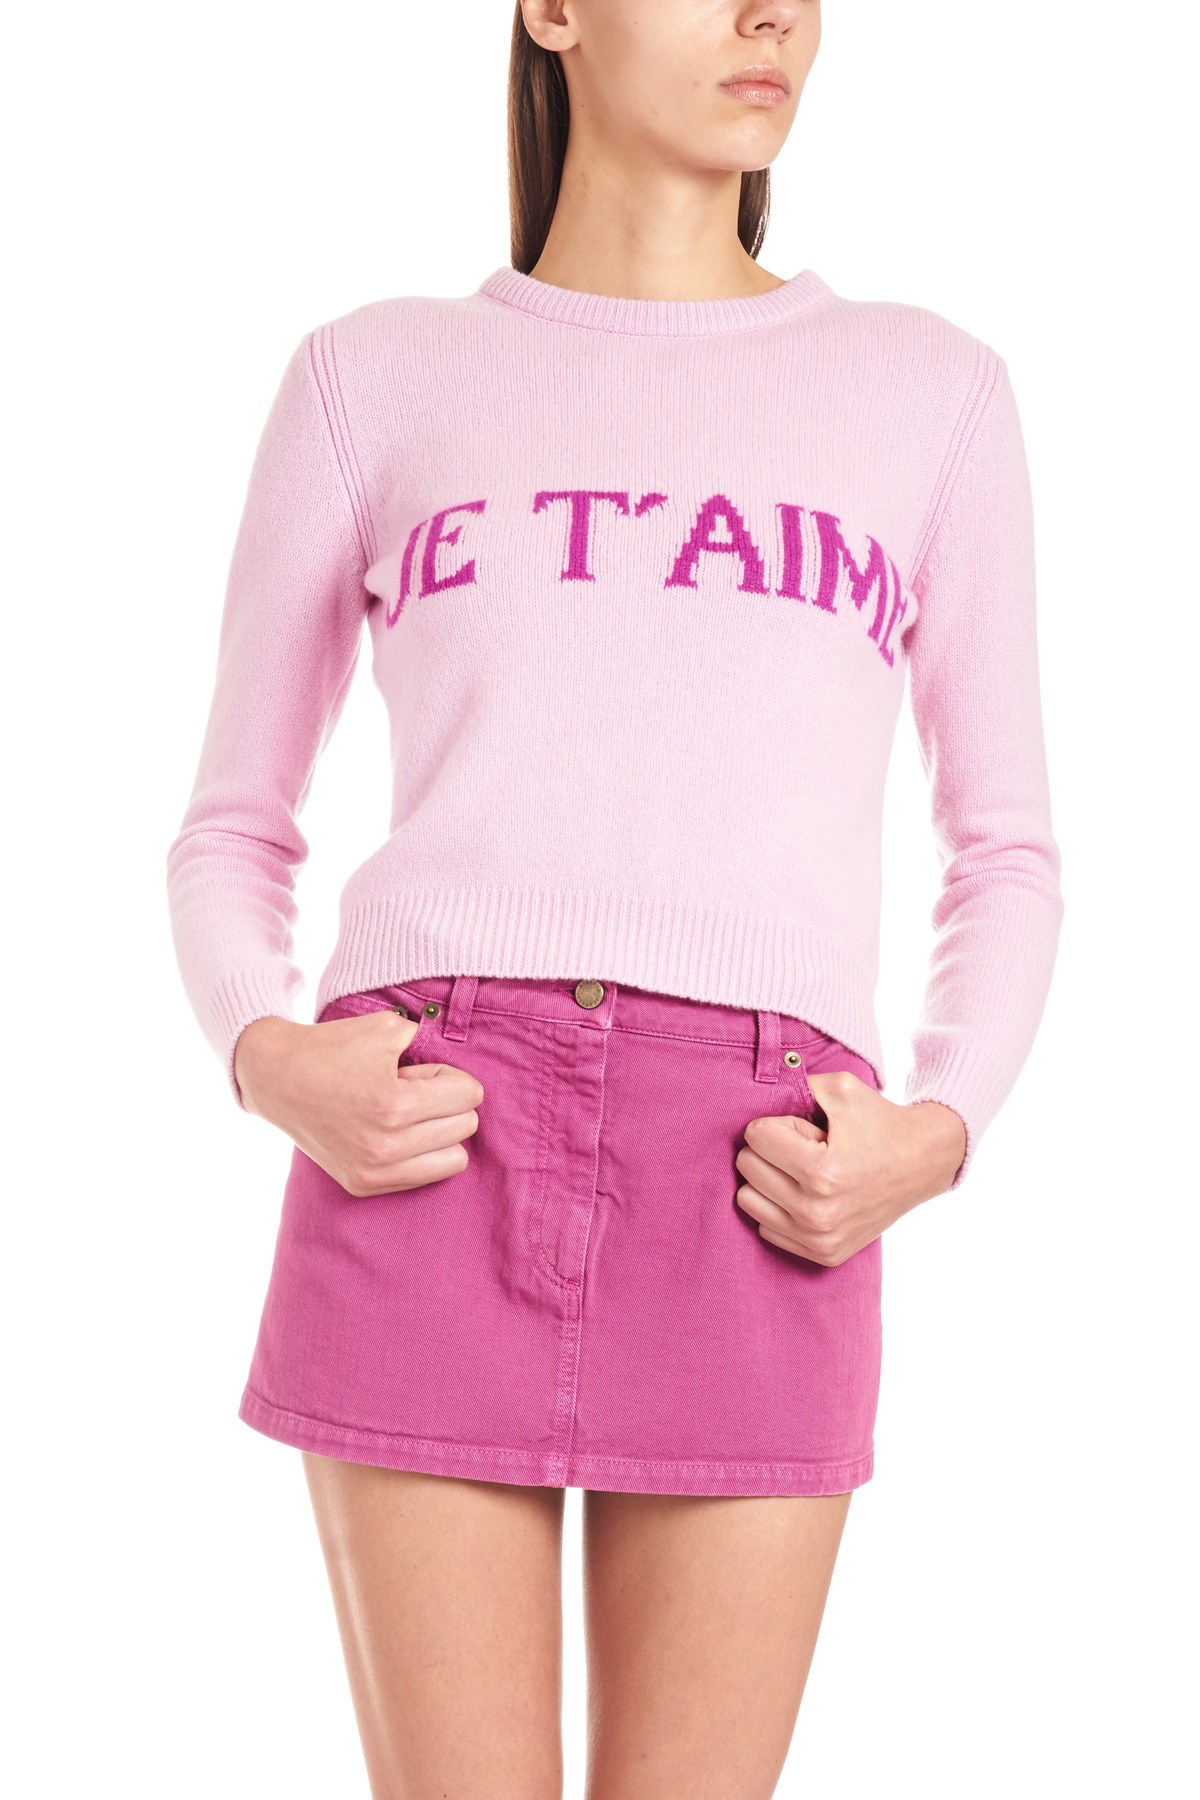 d0007f2c62f0 alberta ferretti 'Je t'aime' sweater available on julian-fashion.com ...